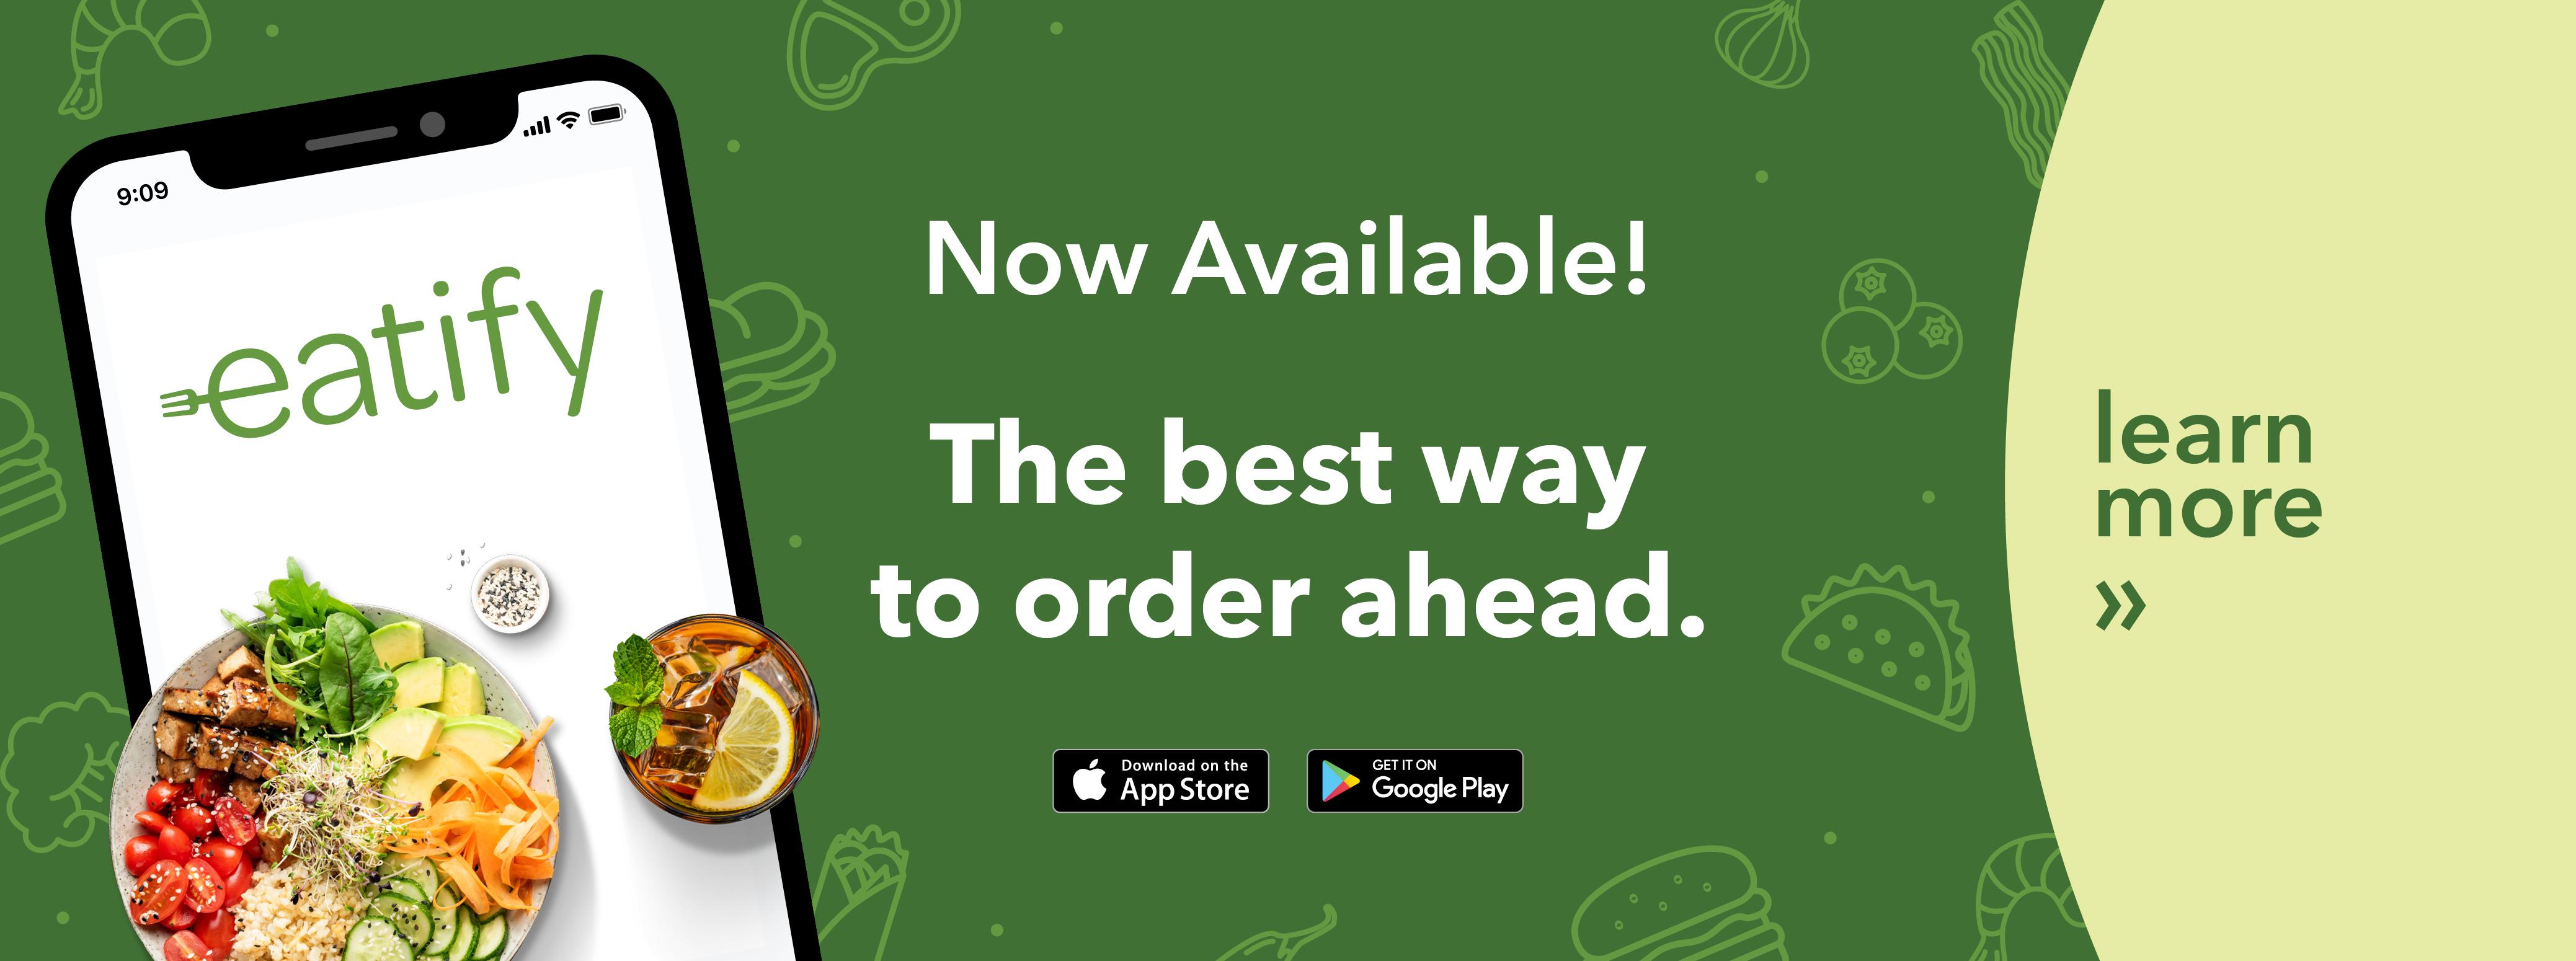 https://flikcafes.compass-usa.com/PublishingImages/Covid/Eatify-web-banners_2020.jpg